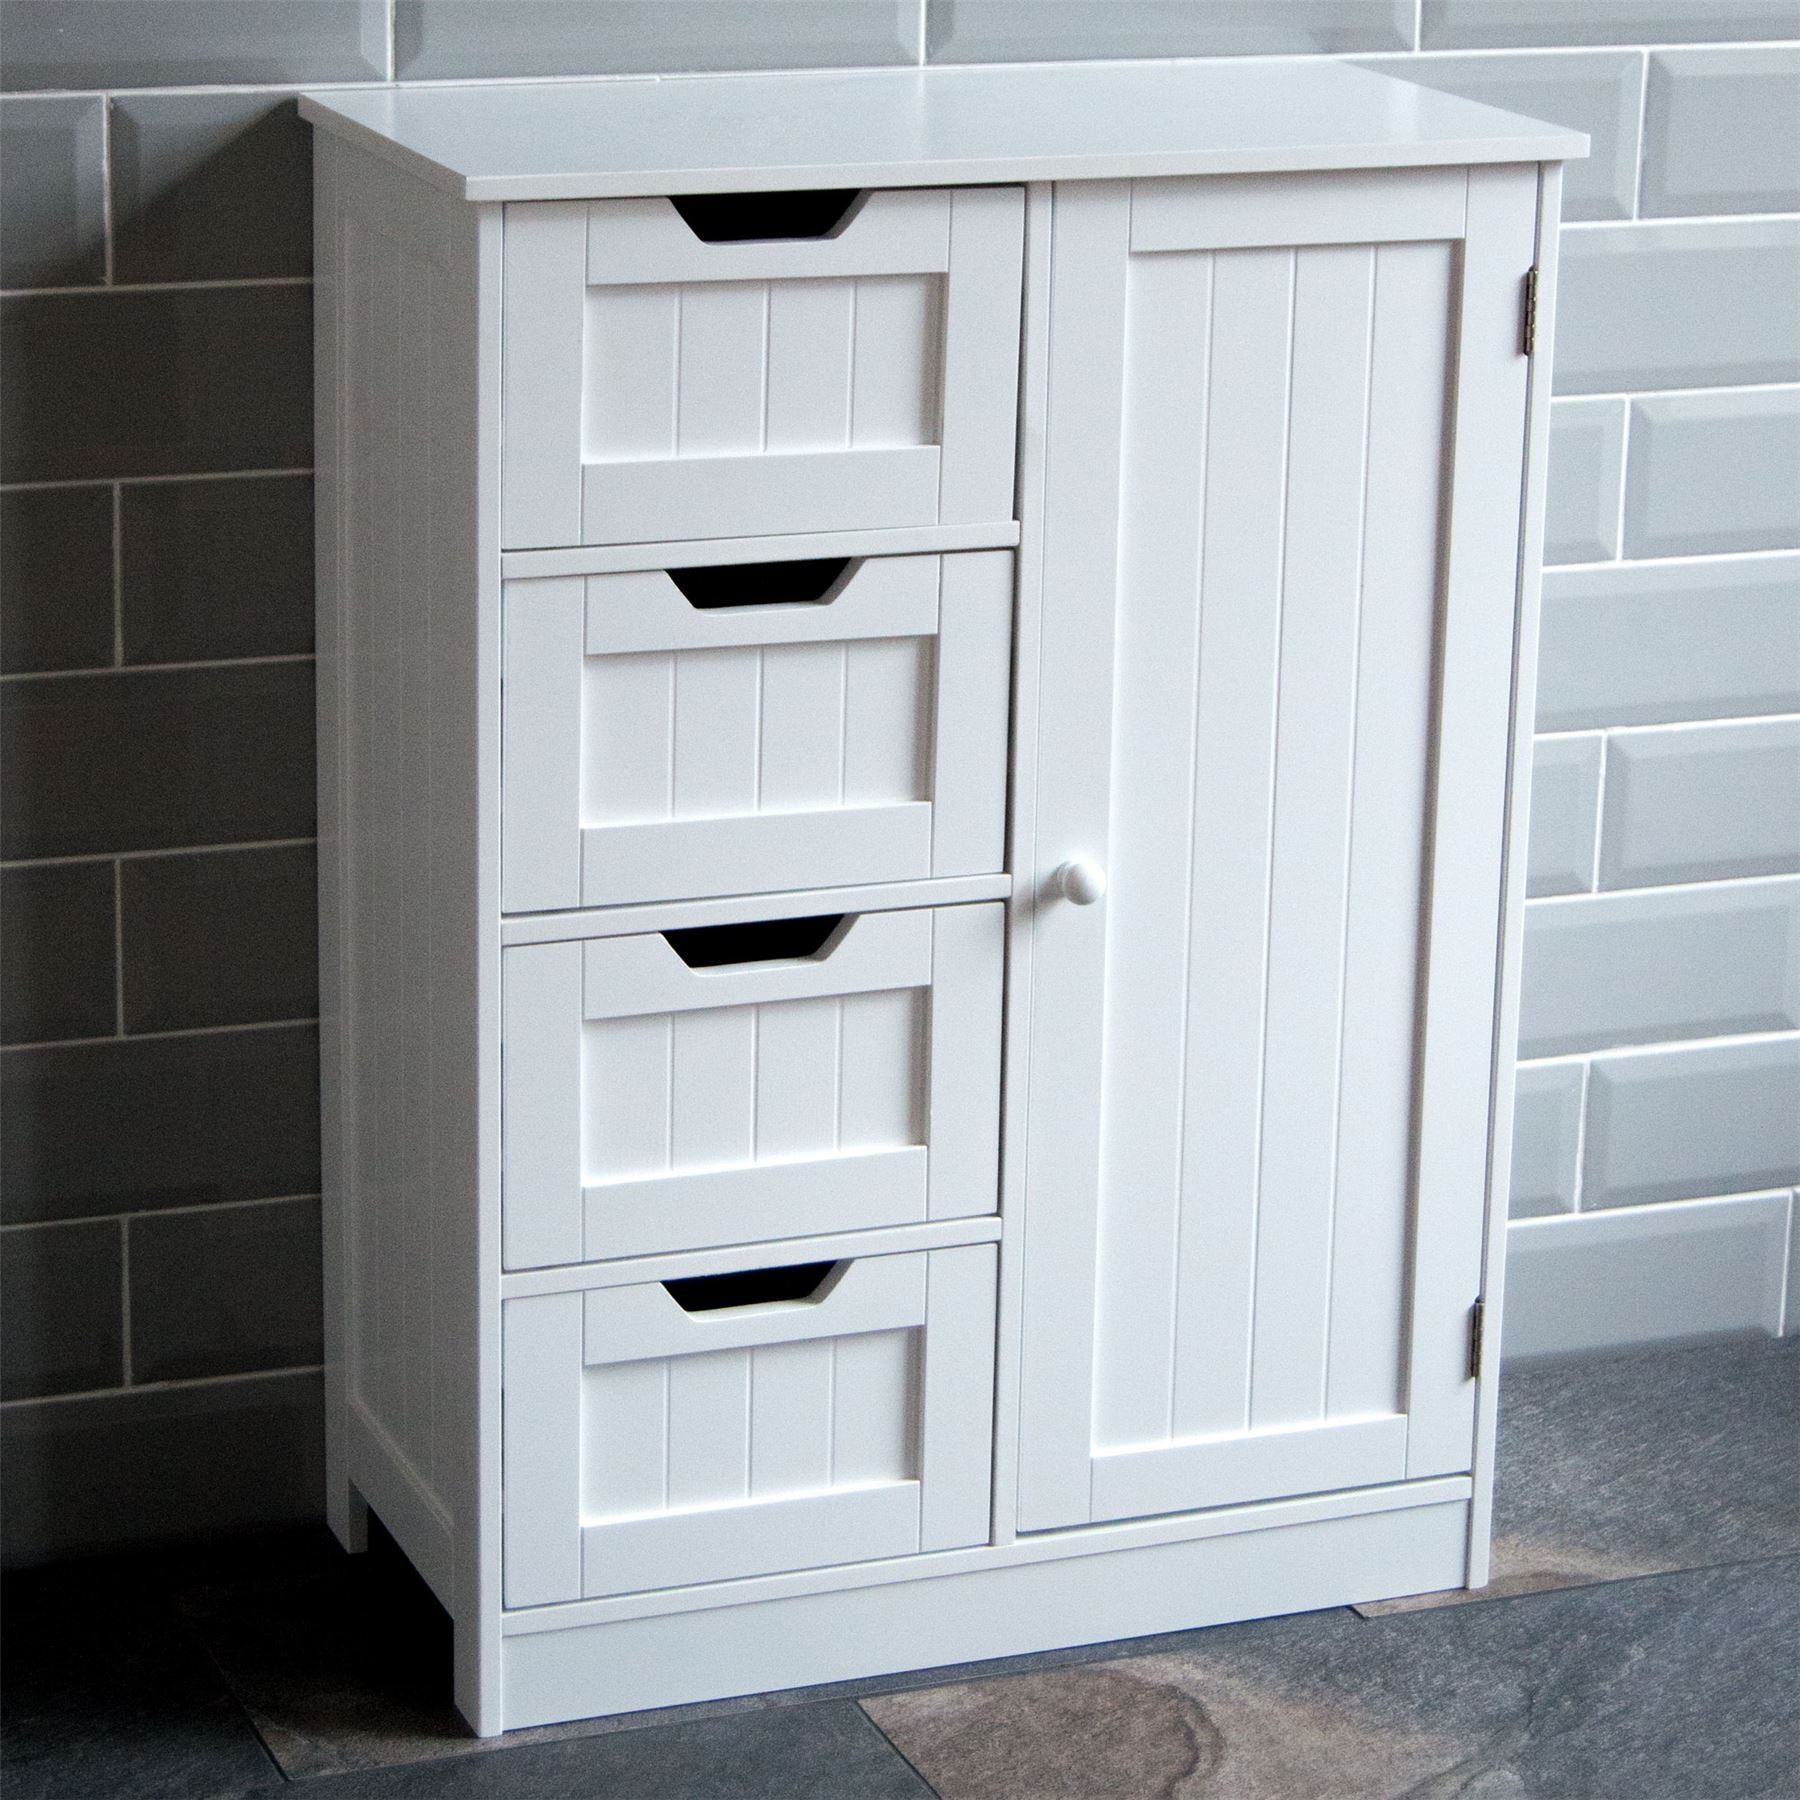 Details About Bathroom 4 Drawer Cabinet Door Storage Cupboard Wooden White Home Discount regarding proportions 1800 X 1800